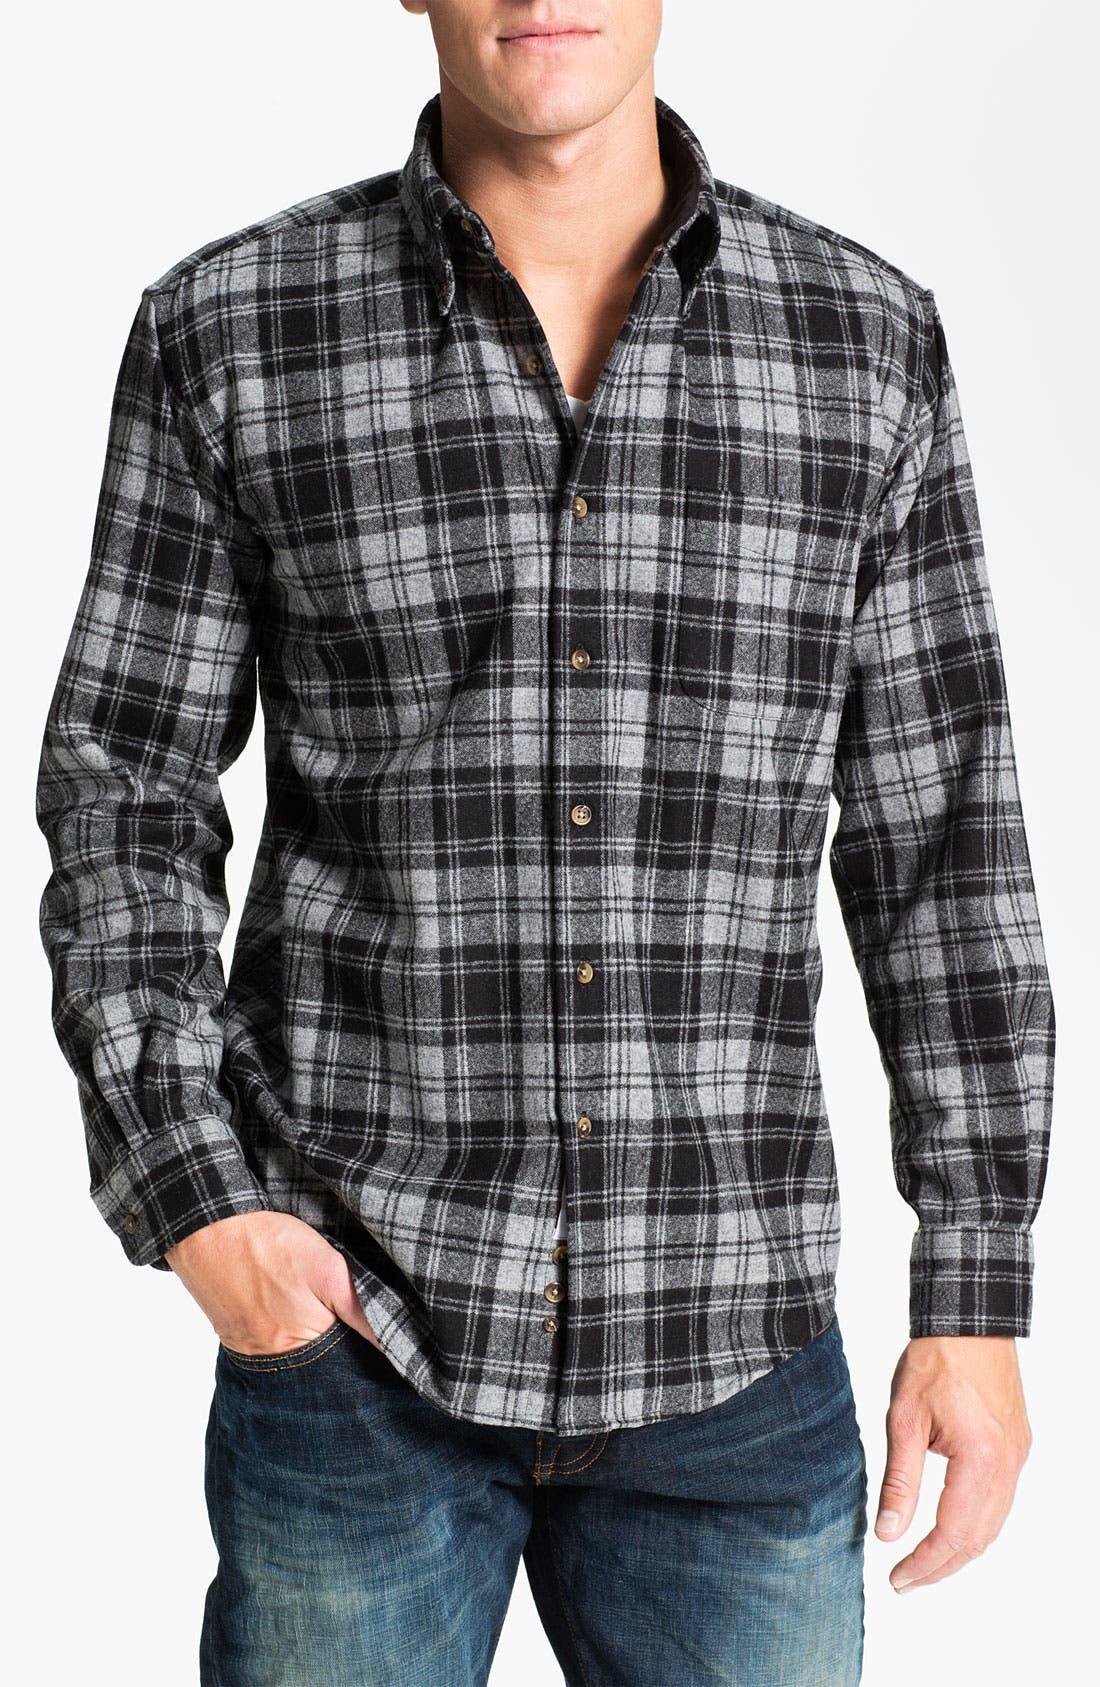 Alternate Image 1 Selected - Pendleton 'Fireside' Wool Plaid Flannel Shirt